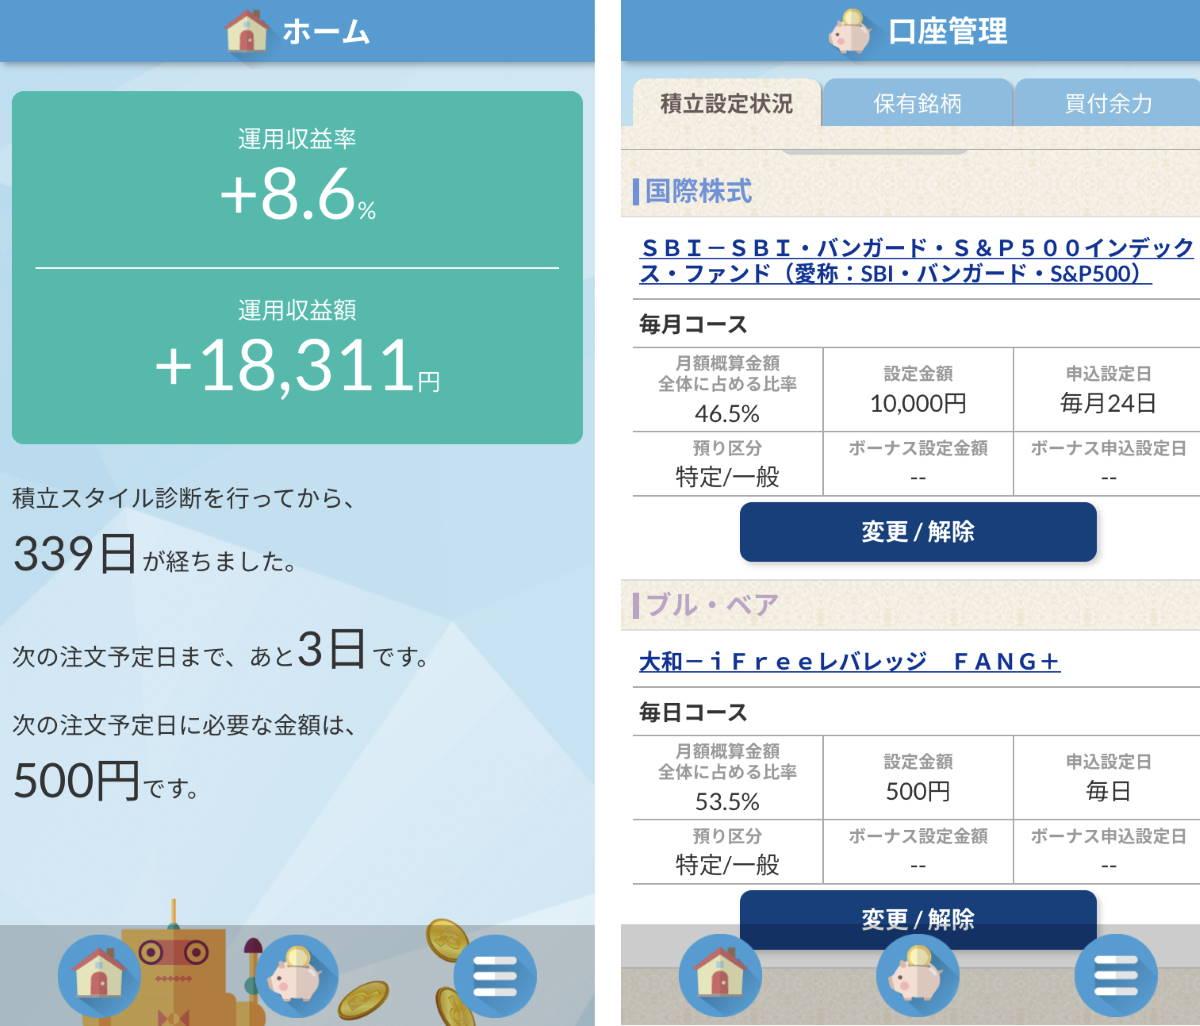 SBI証券かんたん積立アプリ